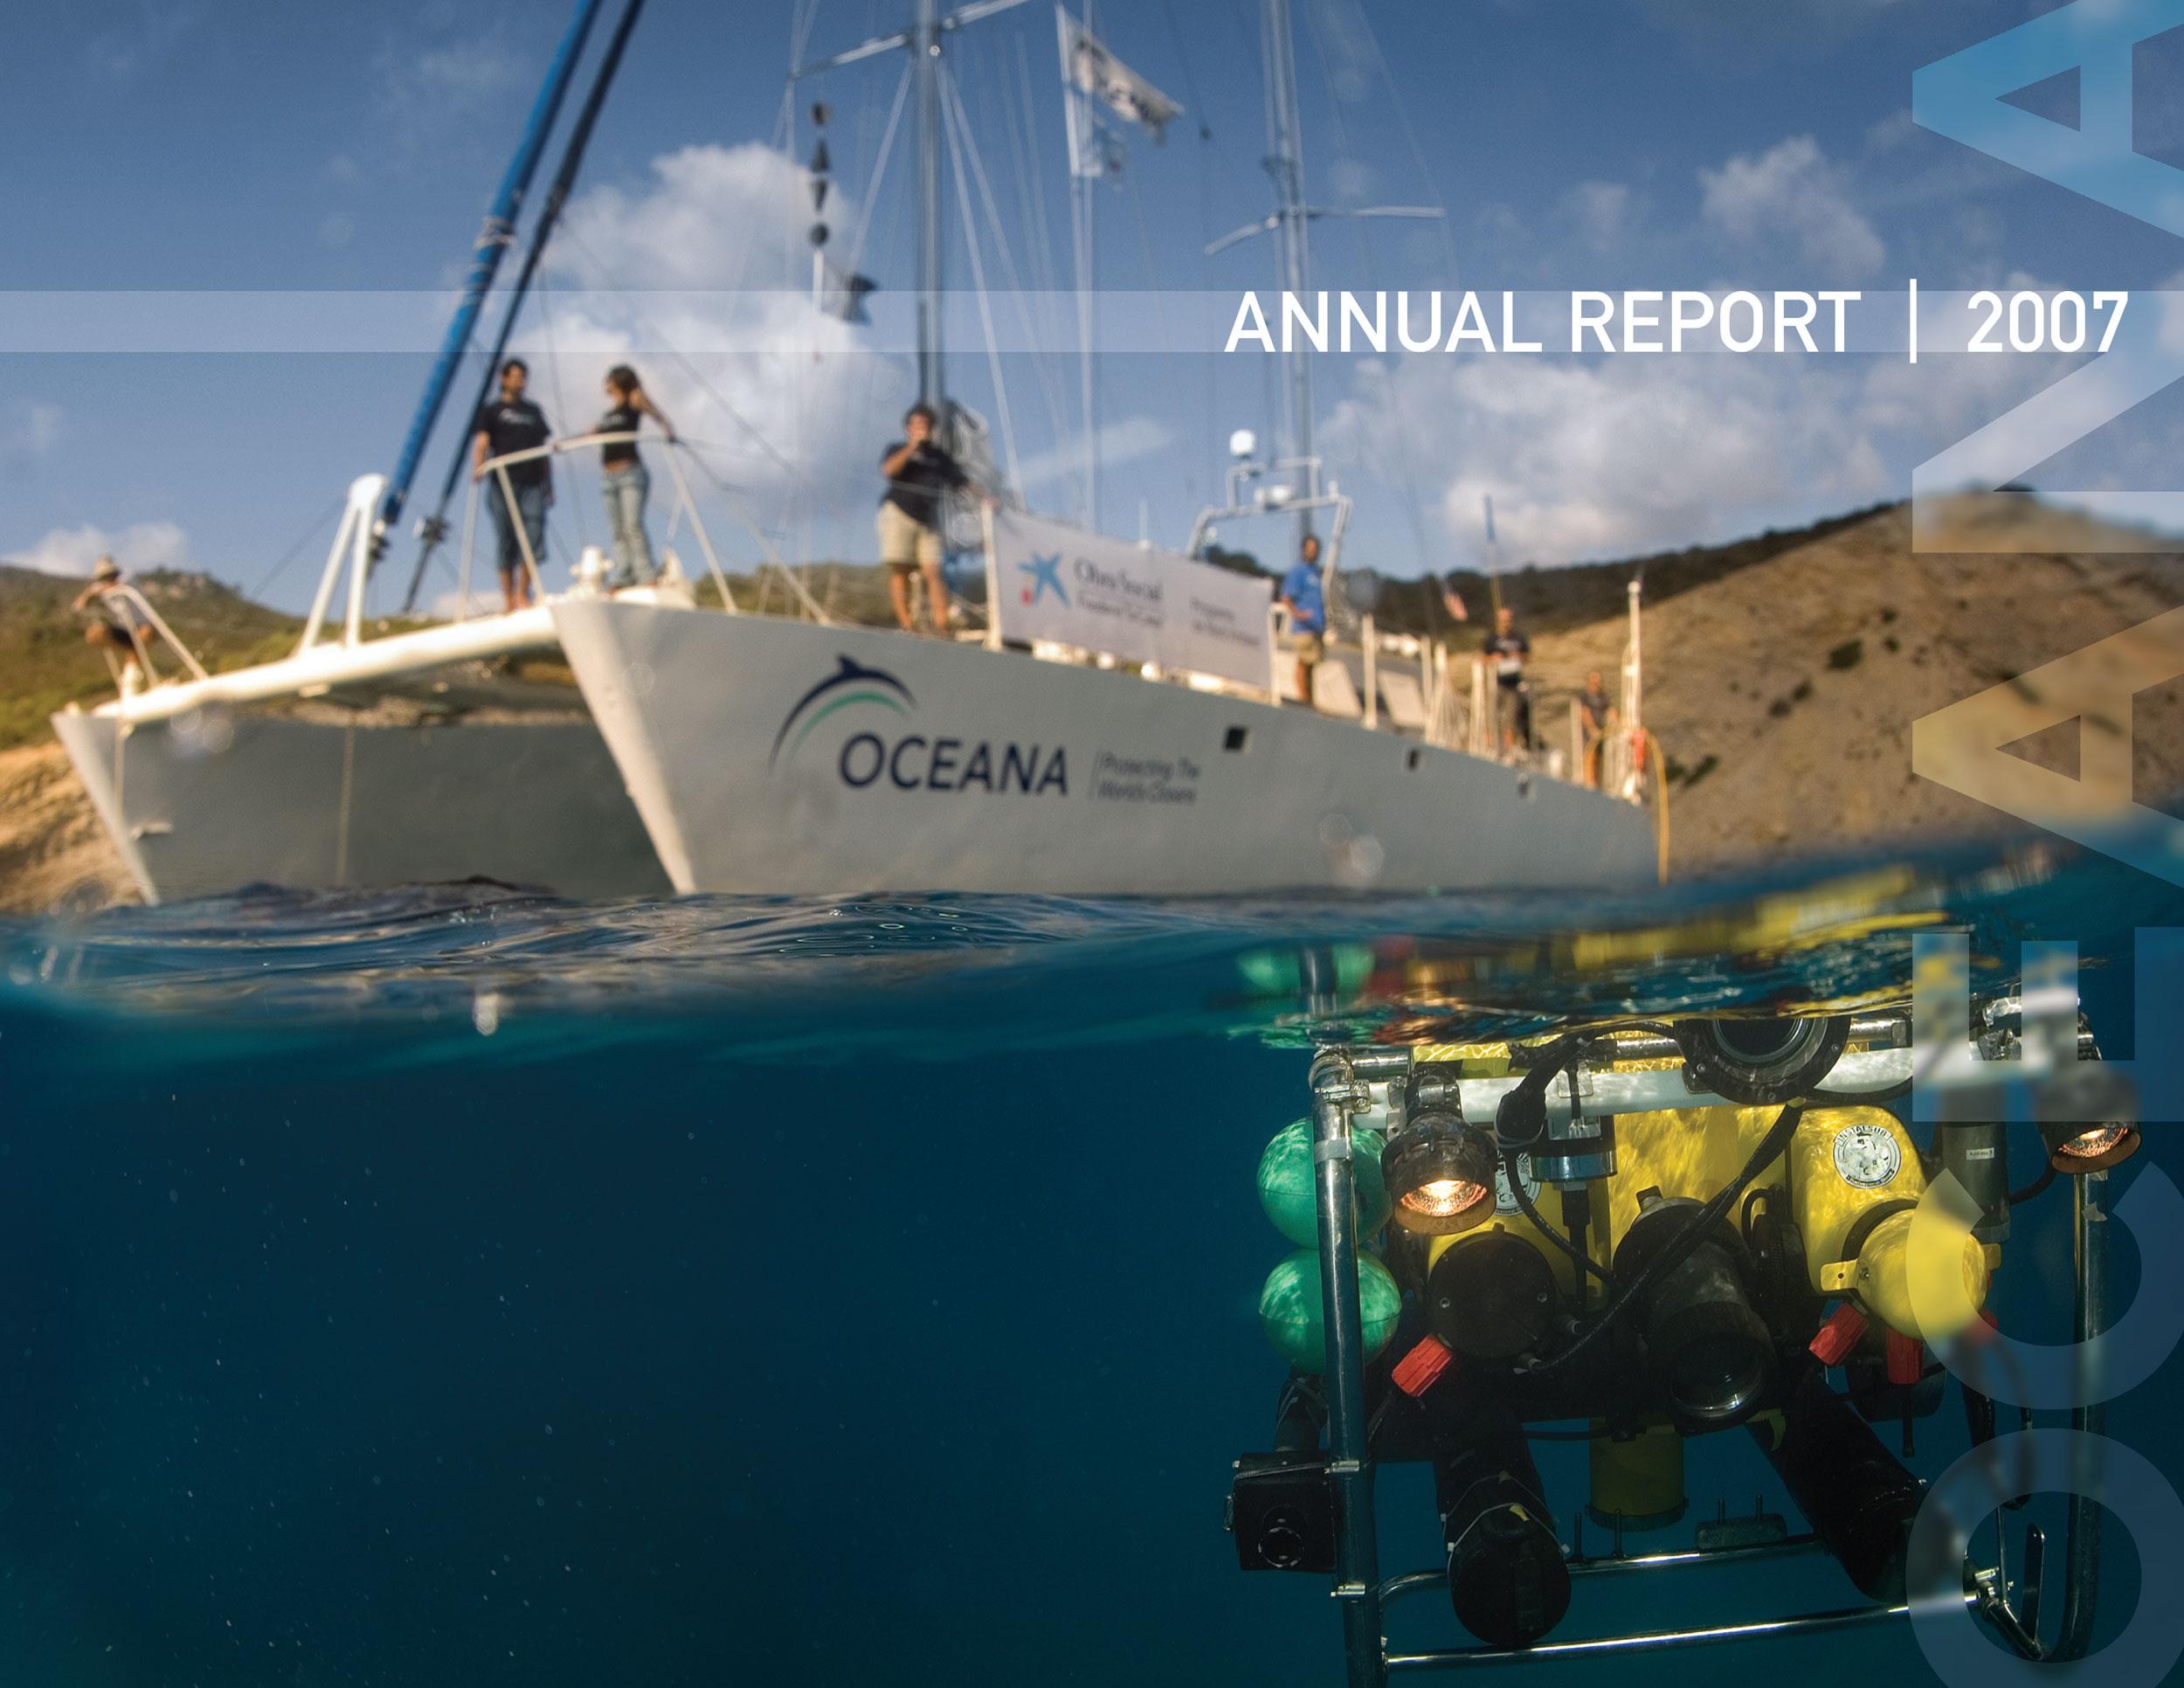 Oceana_annual_report07_FINAL-1.jpg